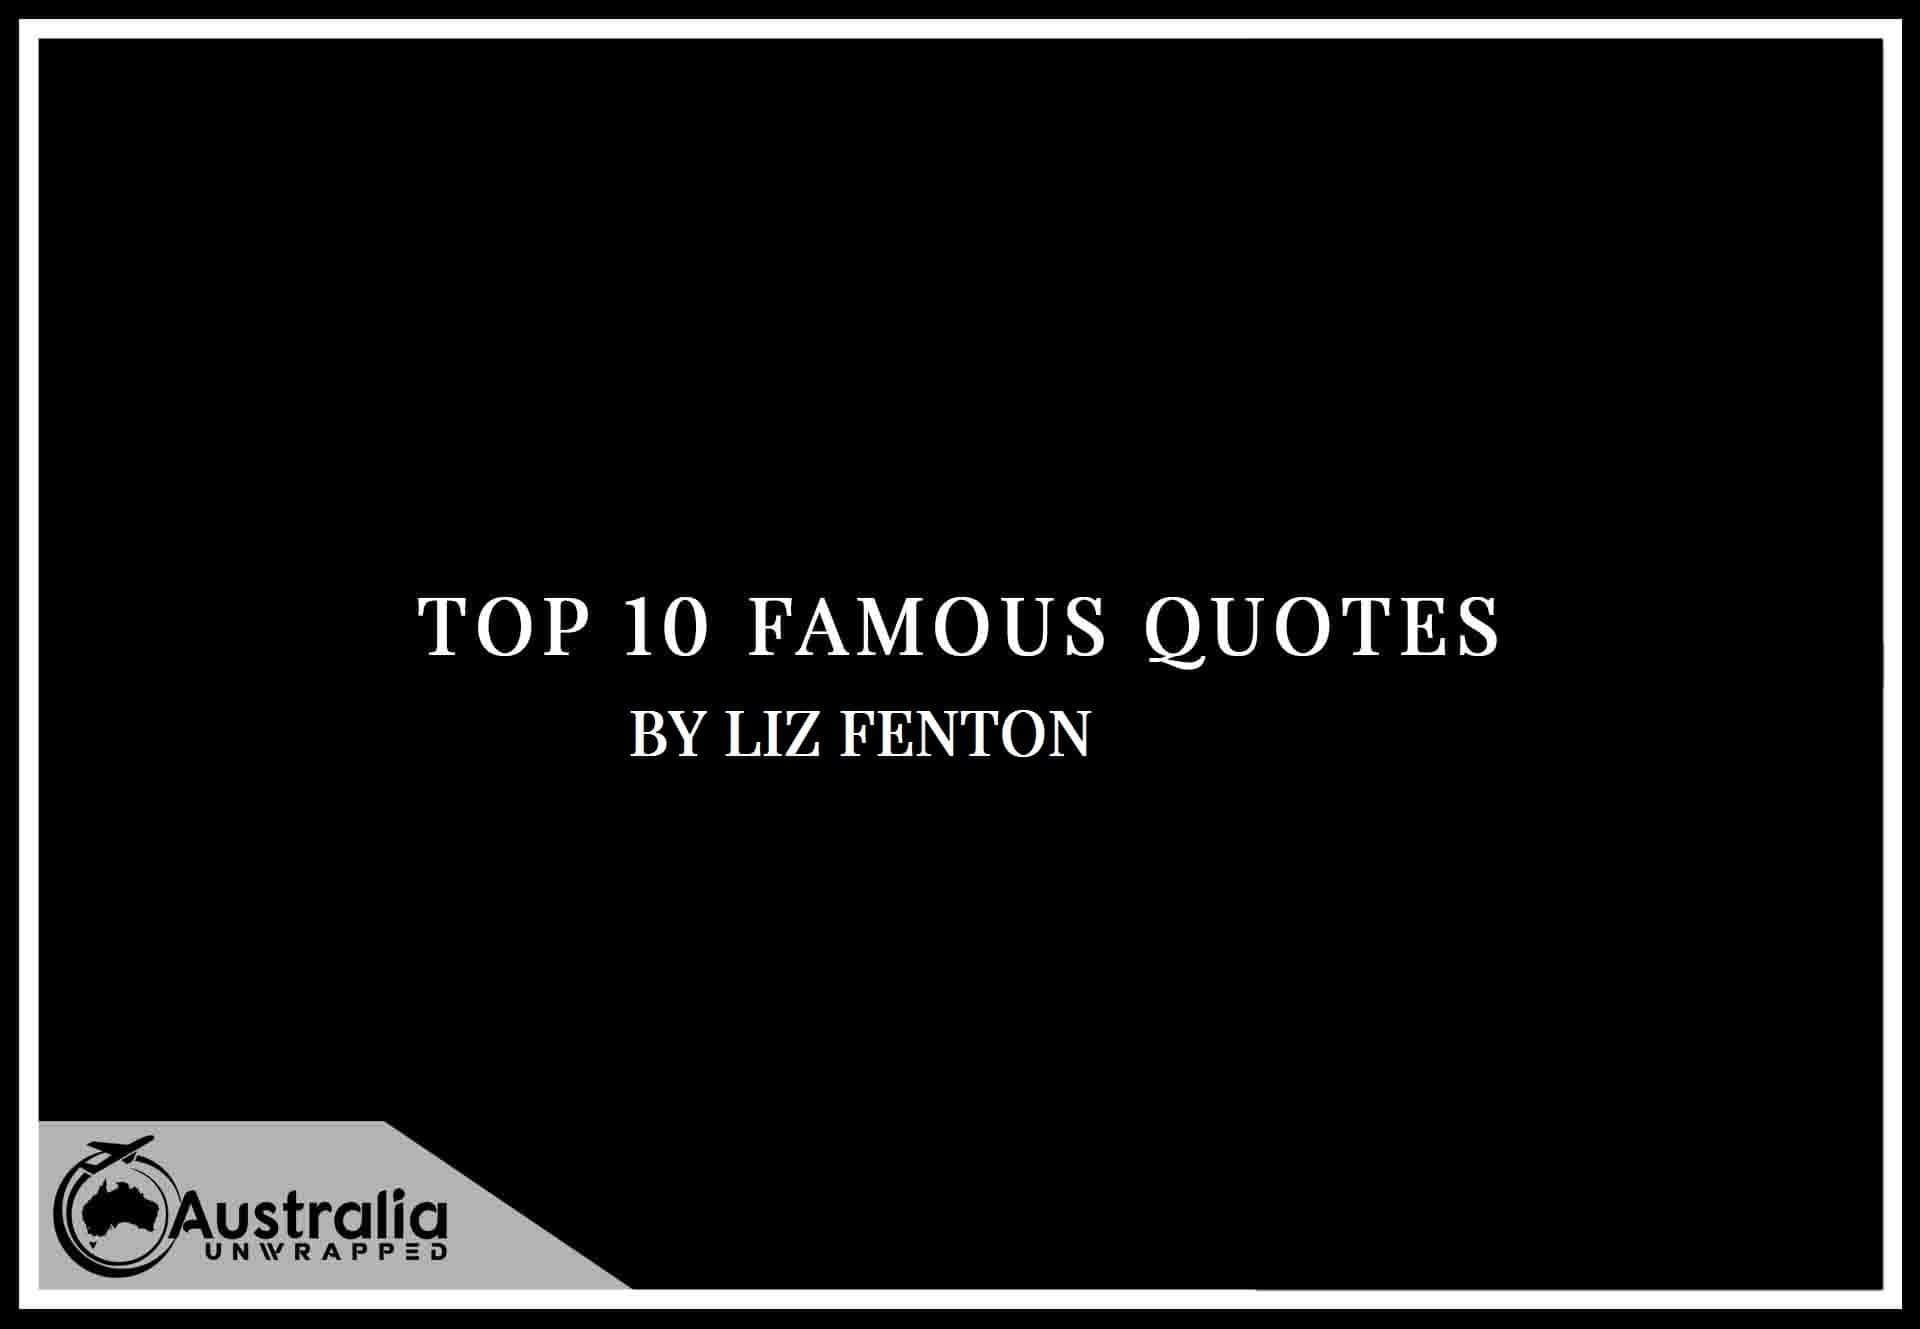 Liz Fenton's Top 10 Popular and Famous Quotes